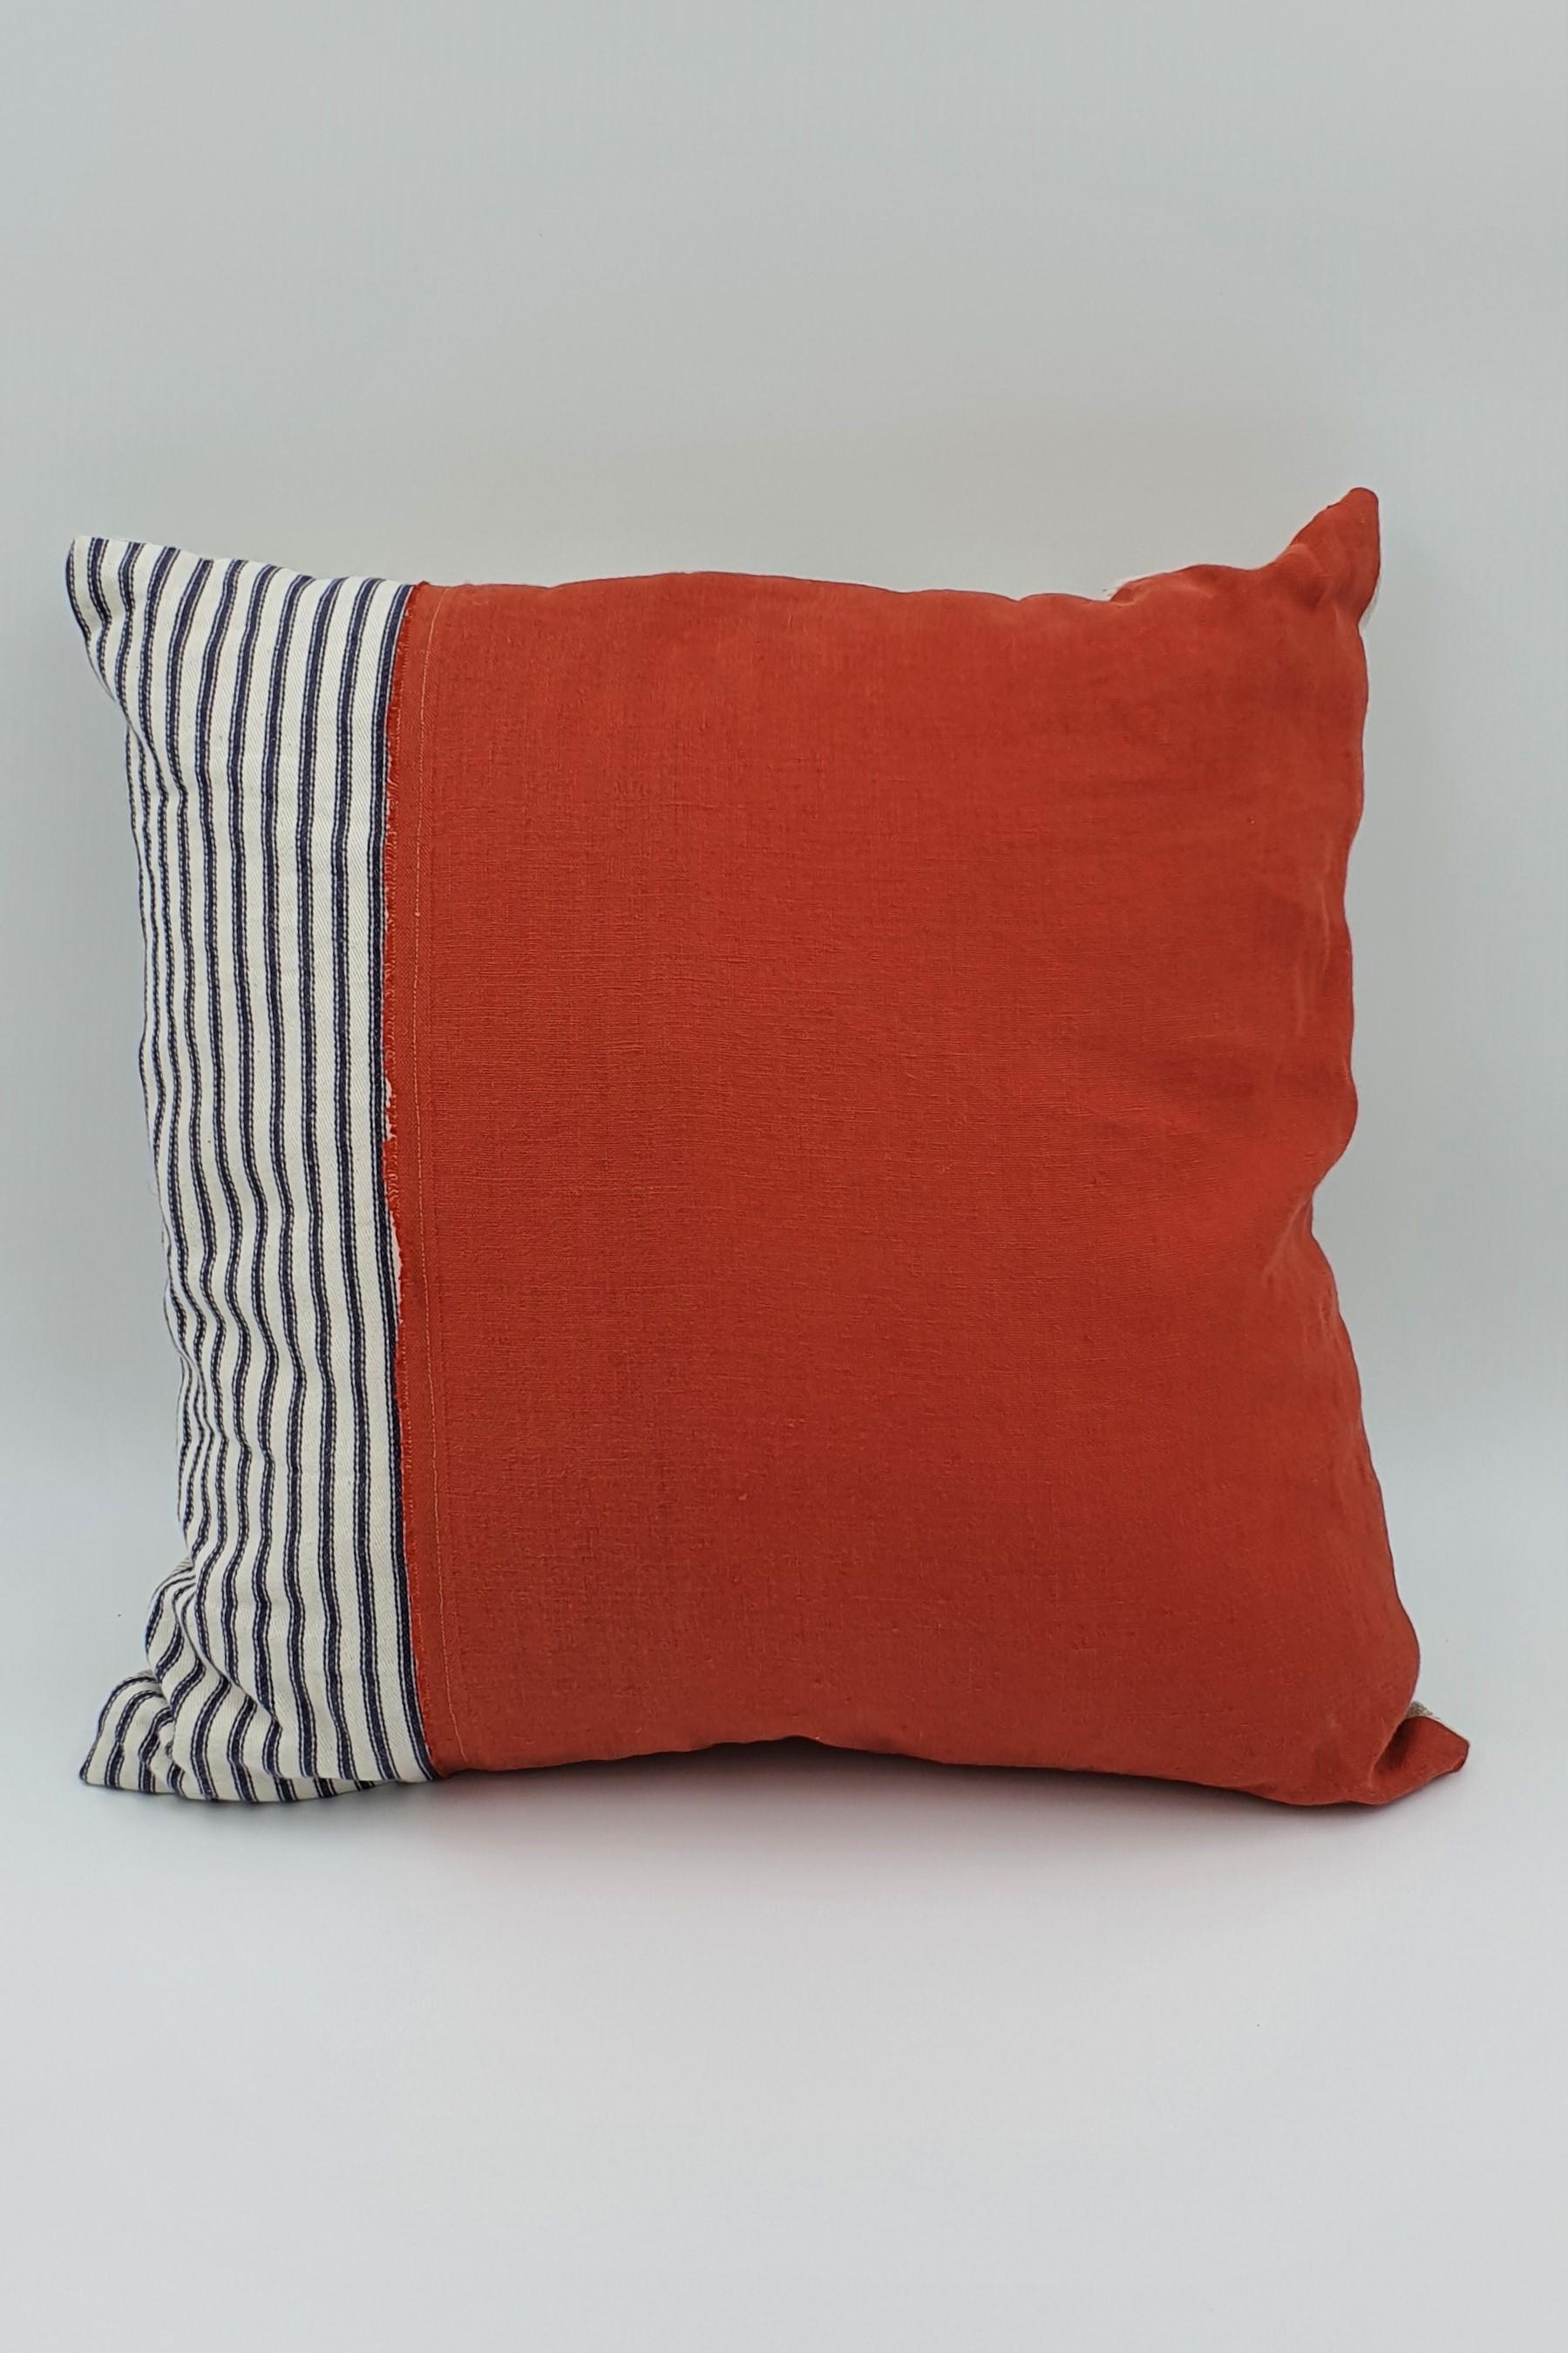 Pebble and stripe Orange square cushion